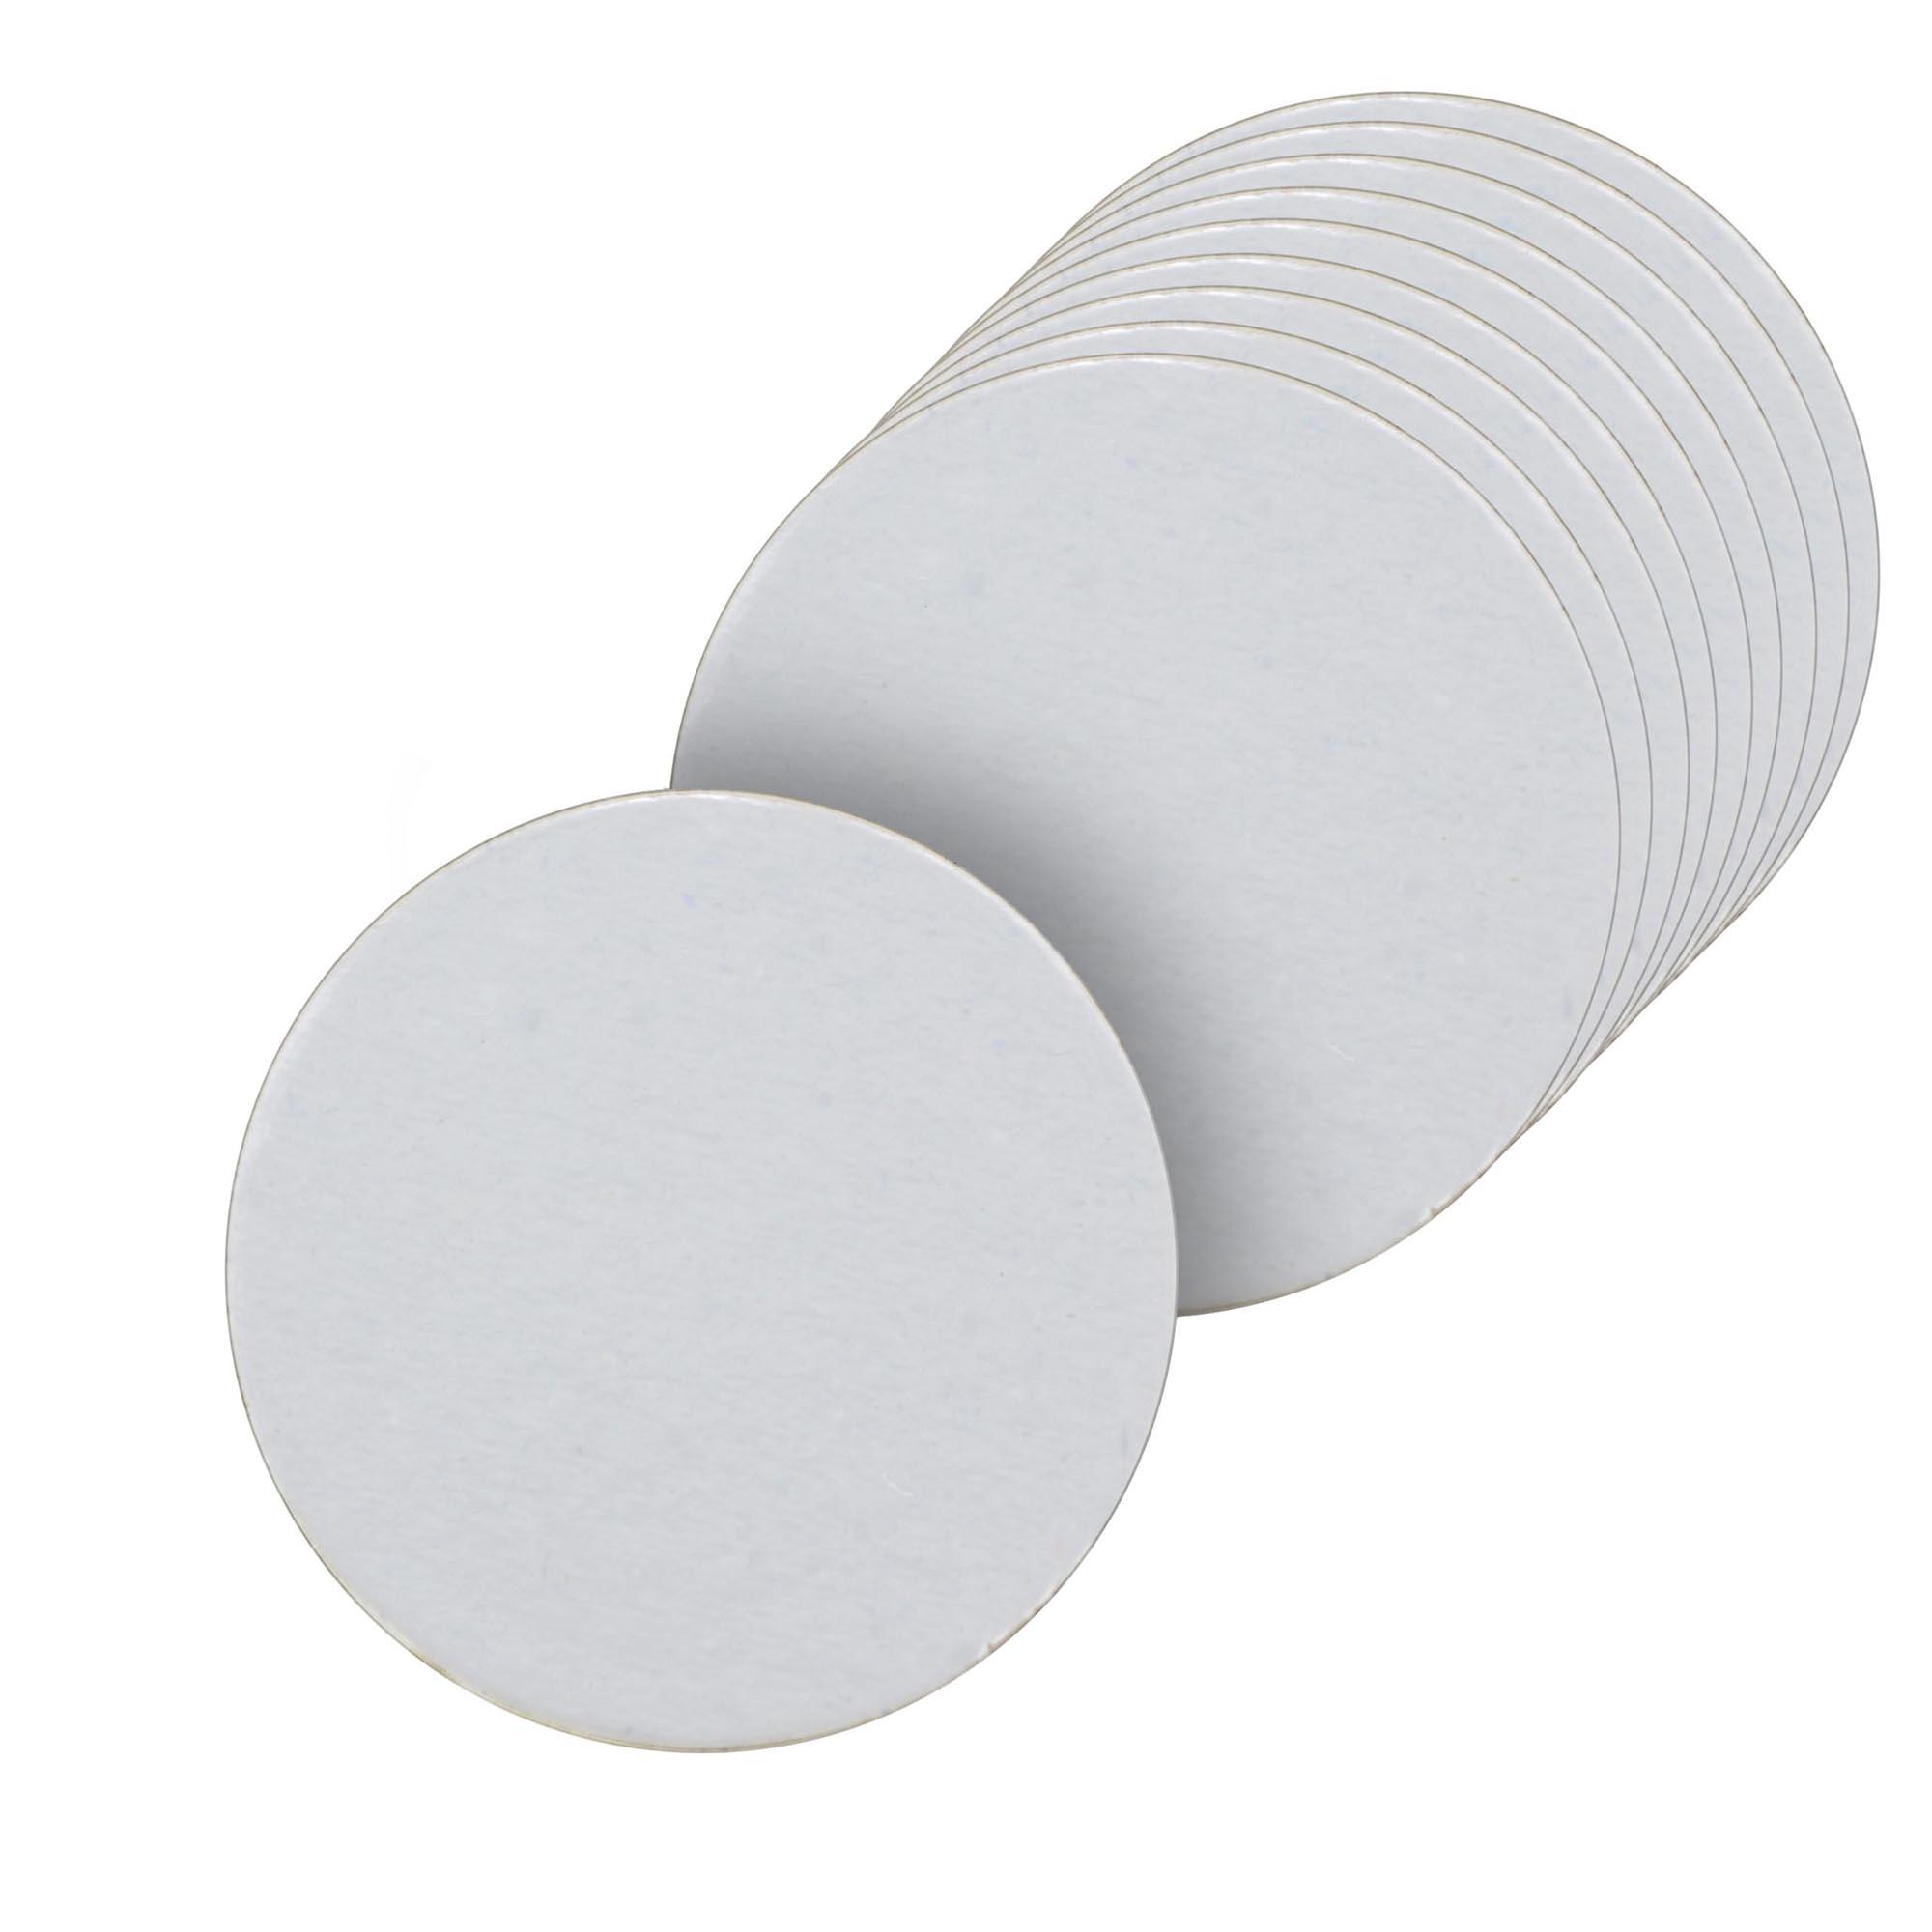 100 Bases Laminadas, Suporte P/ Doces, Disco 6cm - Branca